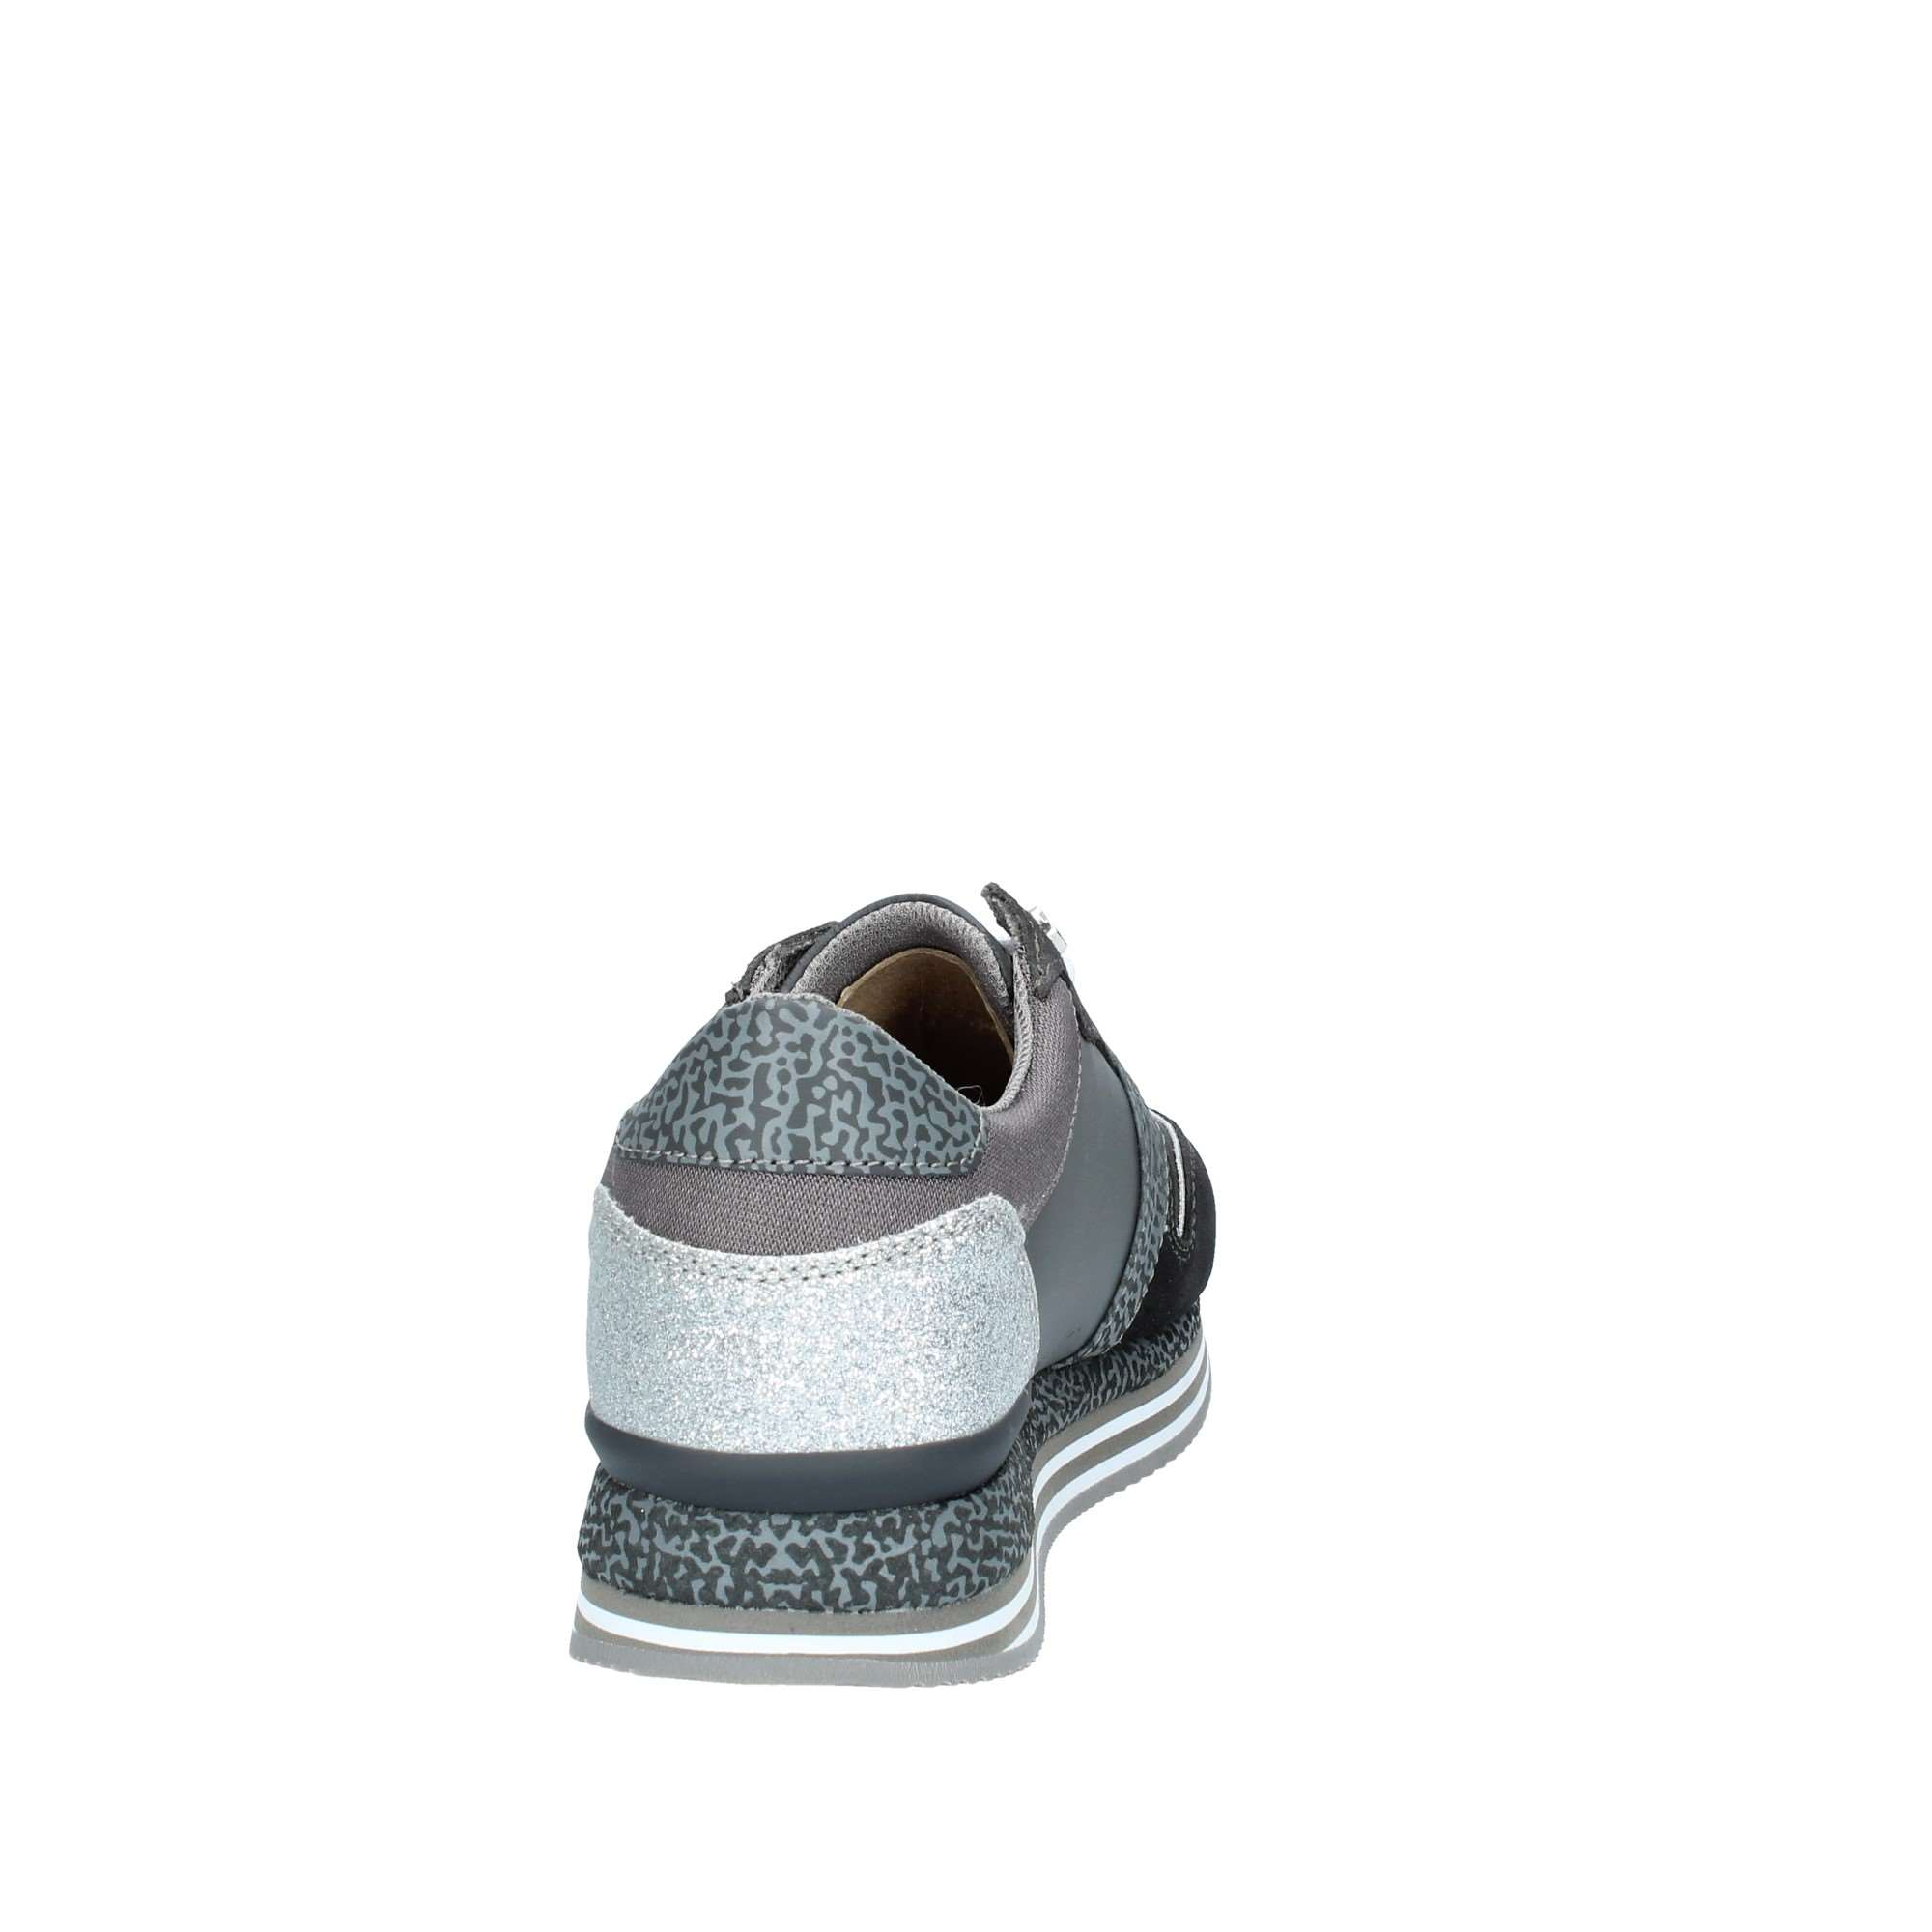 Borbonese 6DP900 6DP900 6DP900 T34 S16 argentoO OP GRIGIO scarpe da ginnastica Donna Autunno Inverno | Aspetto Elegante  | Uomo/Donne Scarpa  fb3597